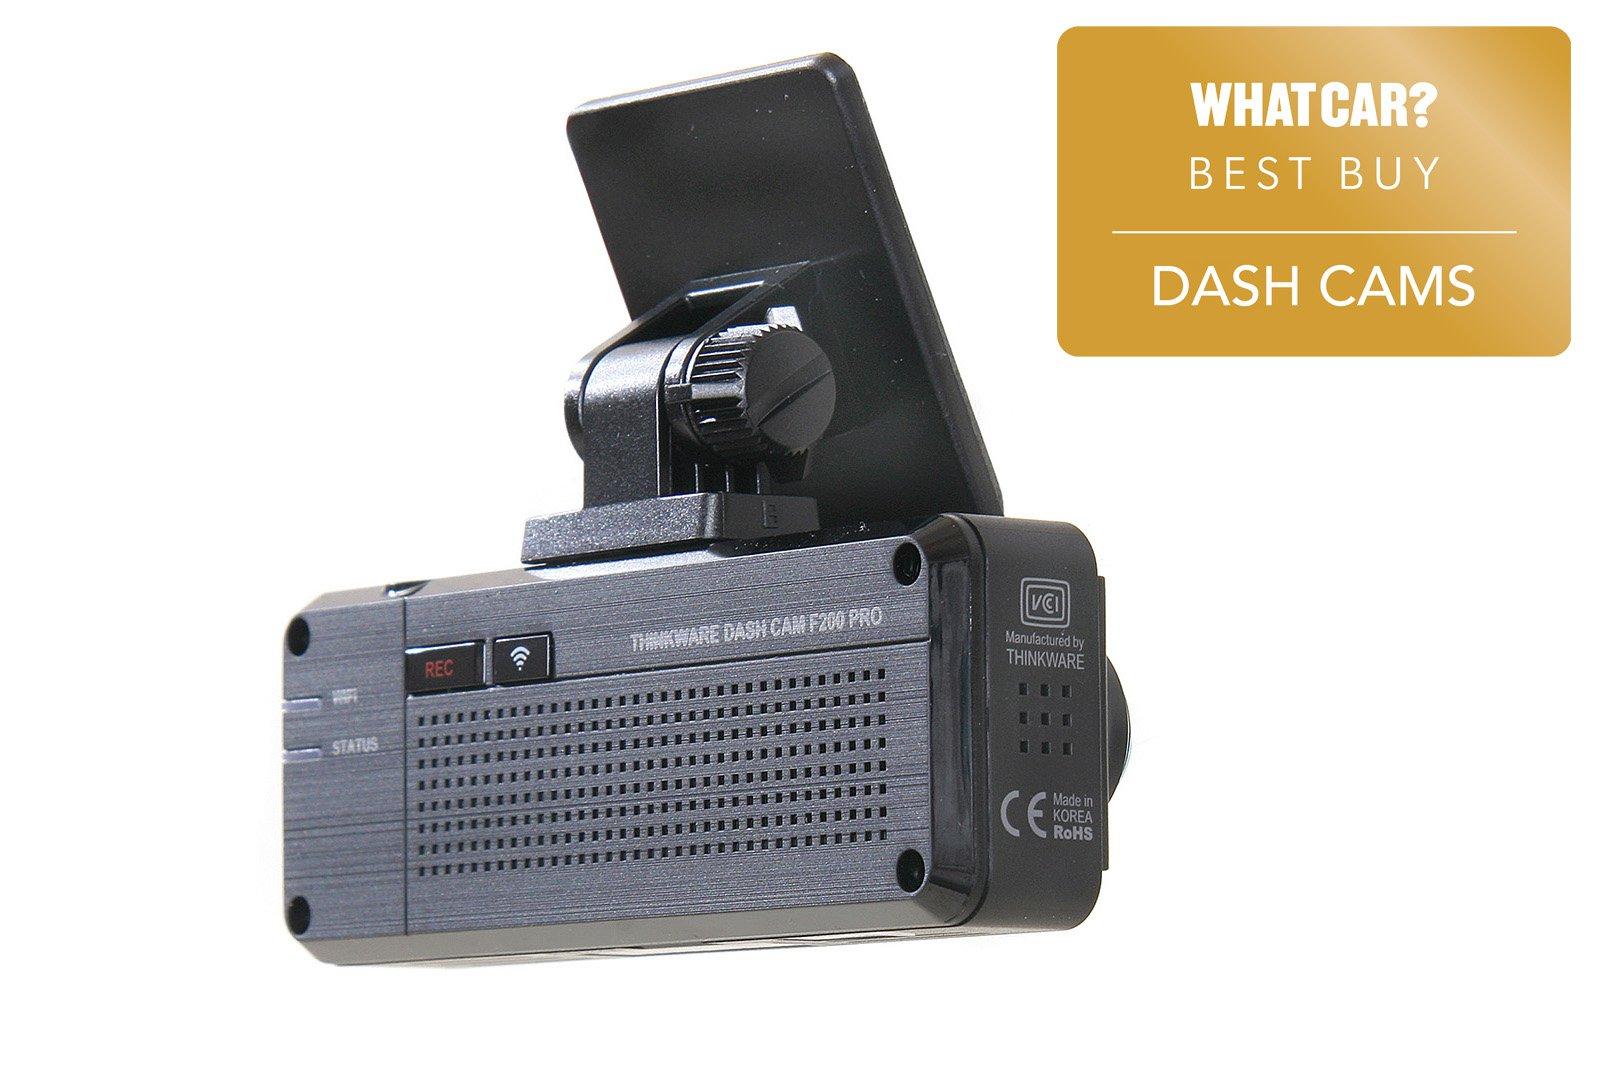 Dash cam Thinkware F200 Pro